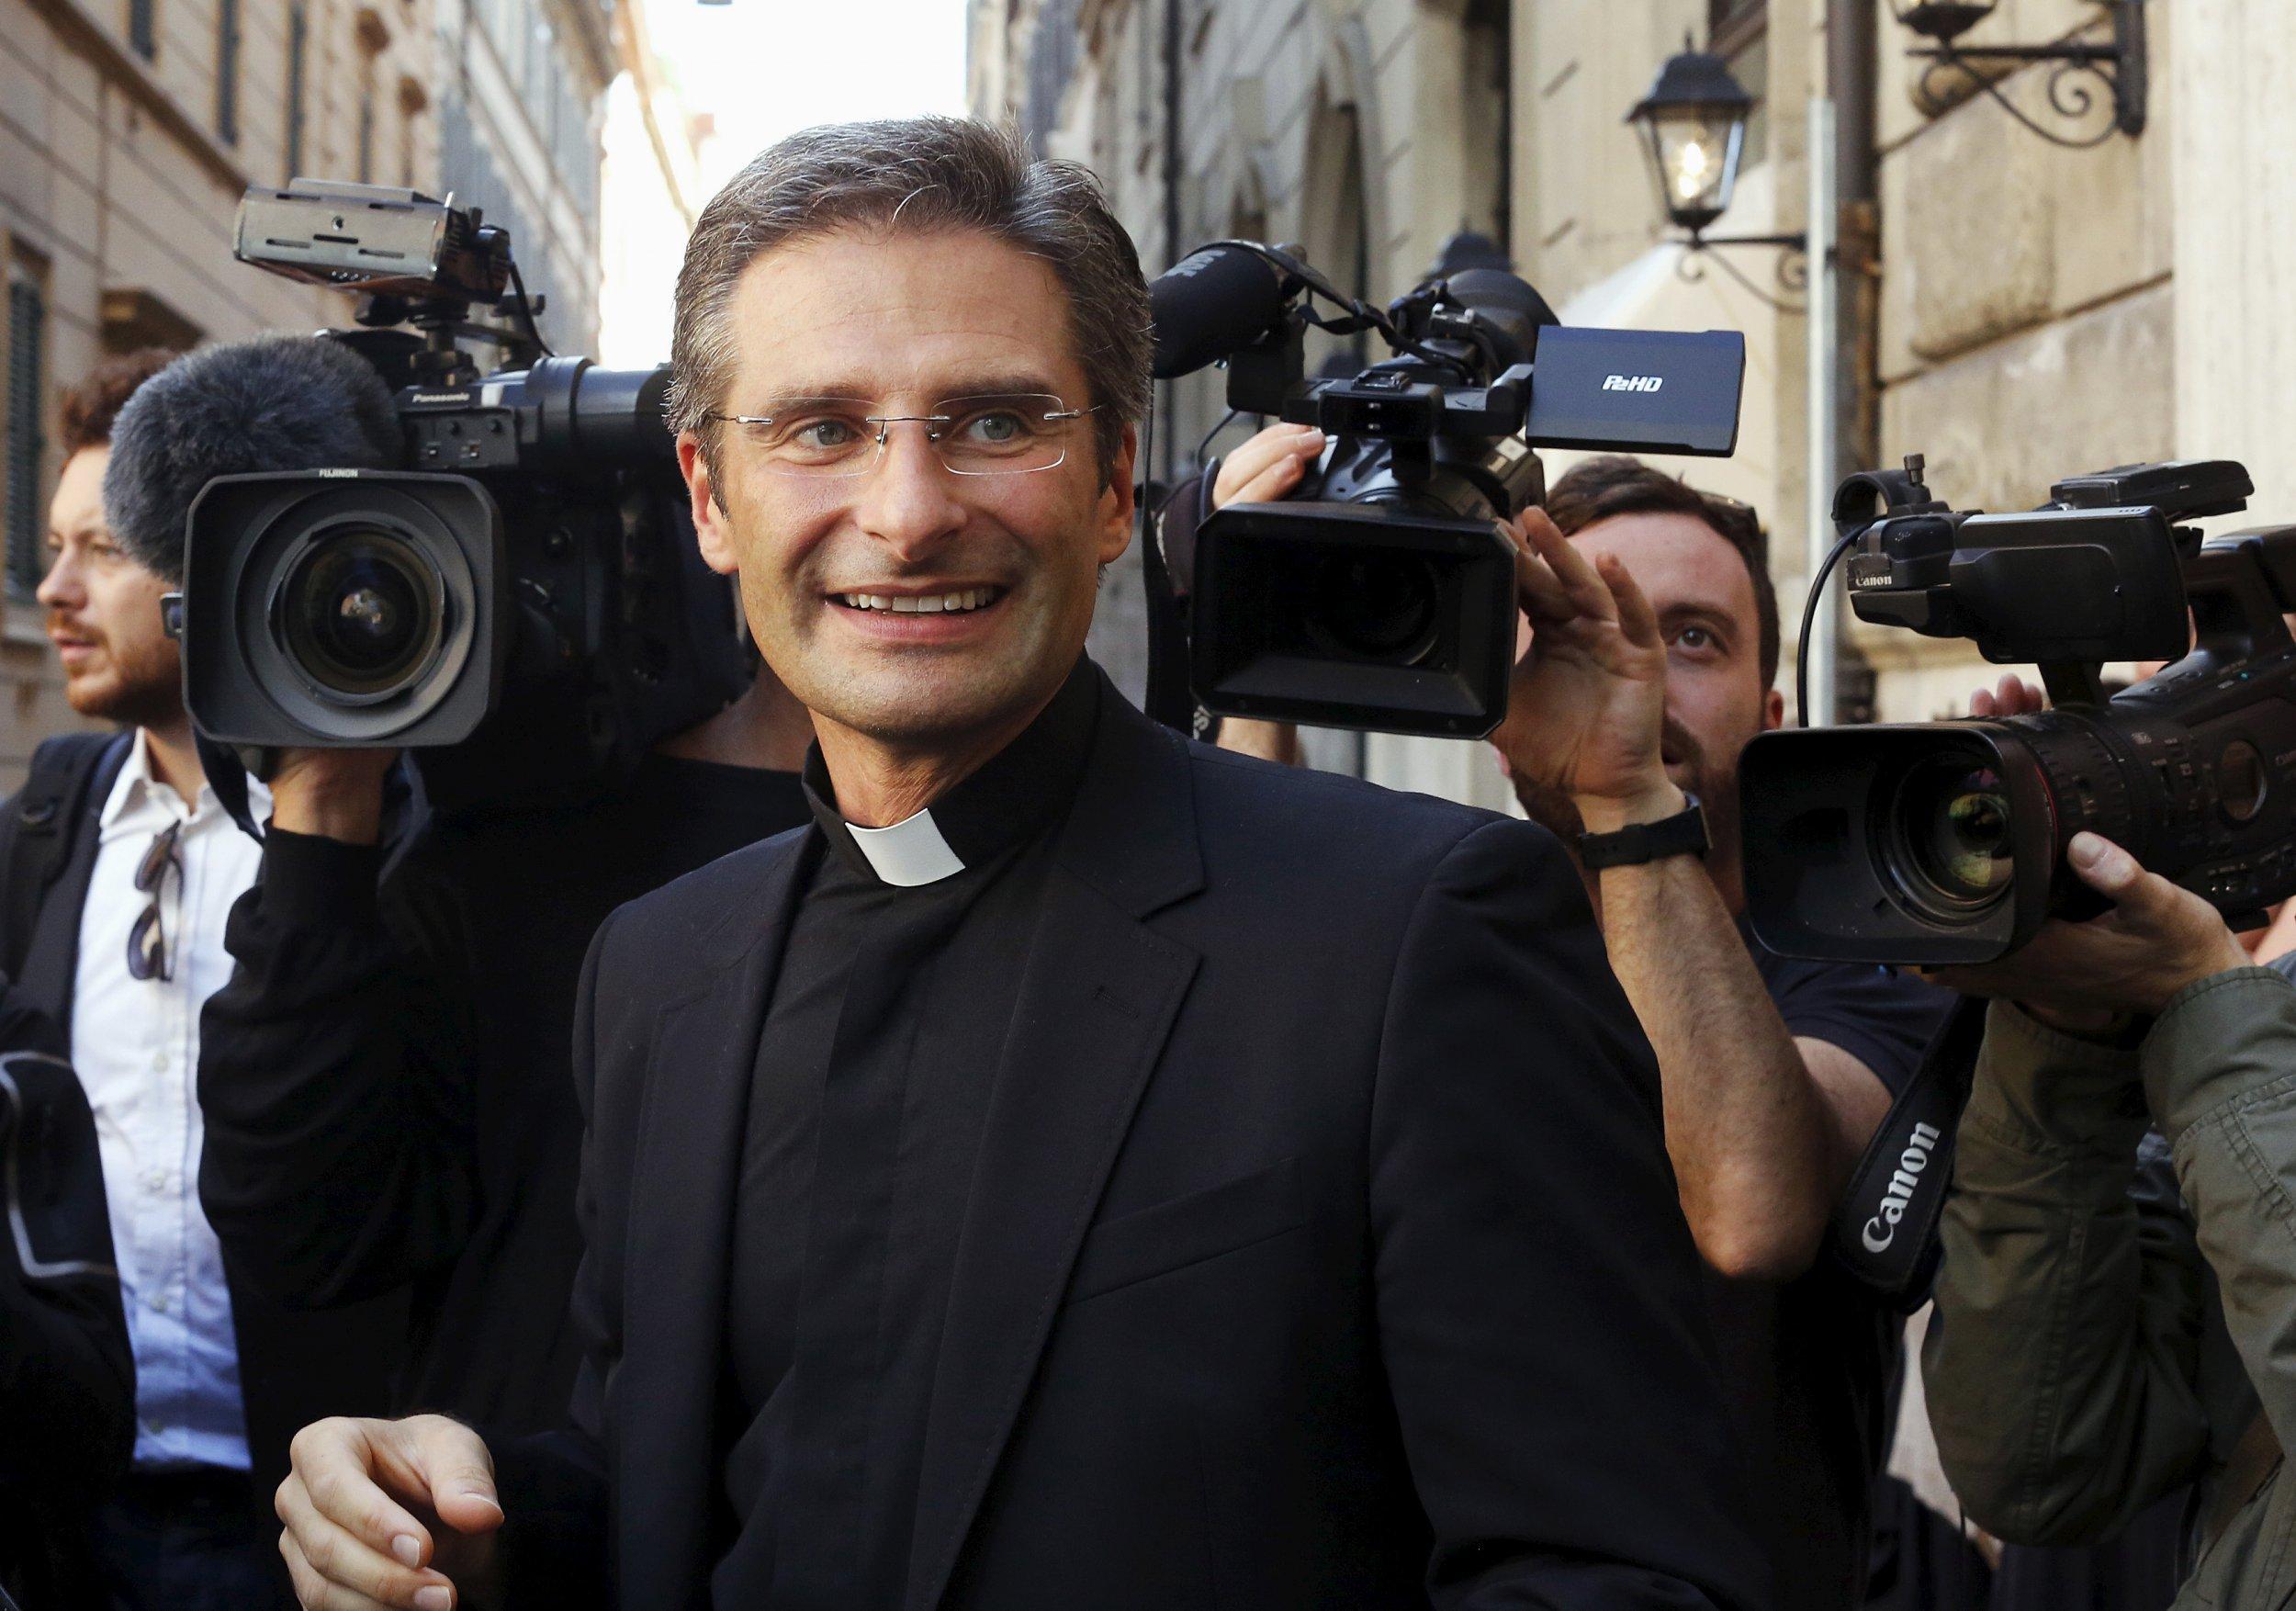 10_03_2015_vatican_gay_priest